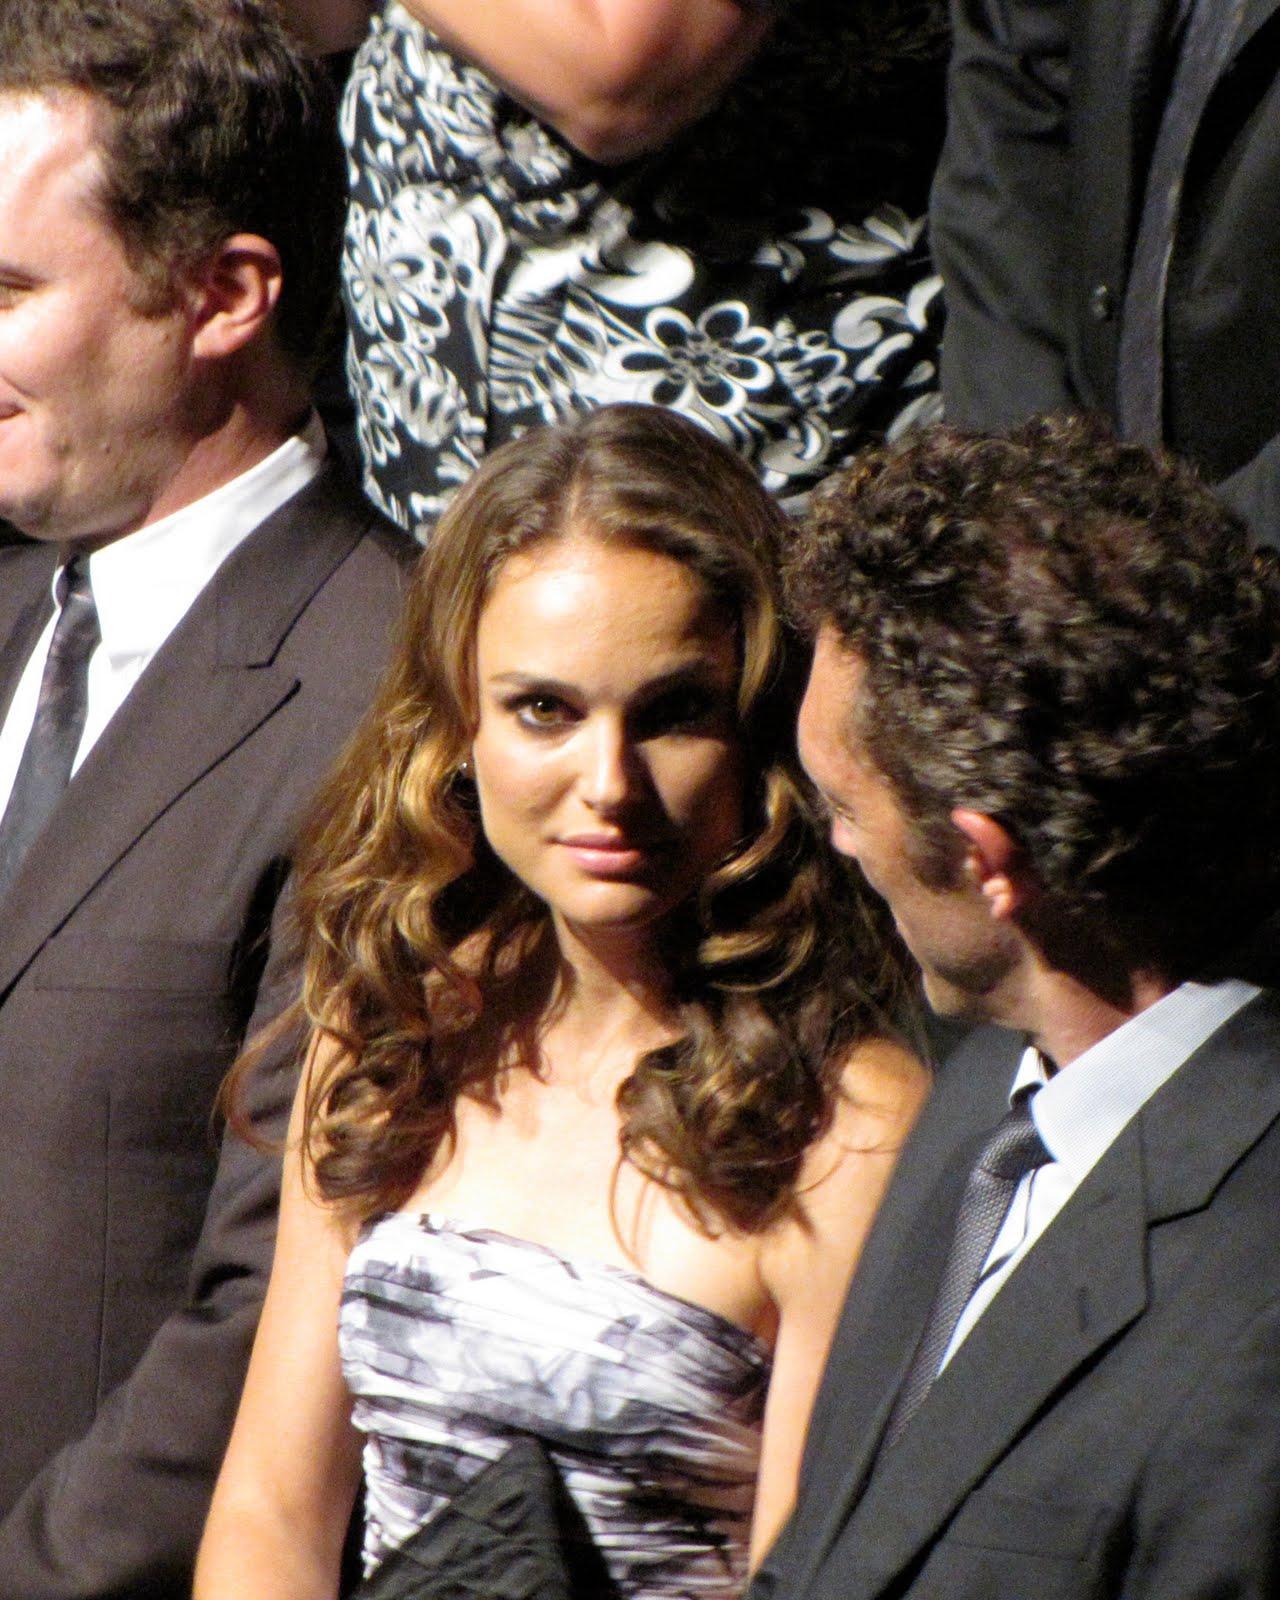 http://1.bp.blogspot.com/_5_7myy6XZuw/TI8MNs-tc7I/AAAAAAAAEZY/RHmjwcM9CrY/s1600/Natalie+Portman+at+Black+Swan+Gala.jpg